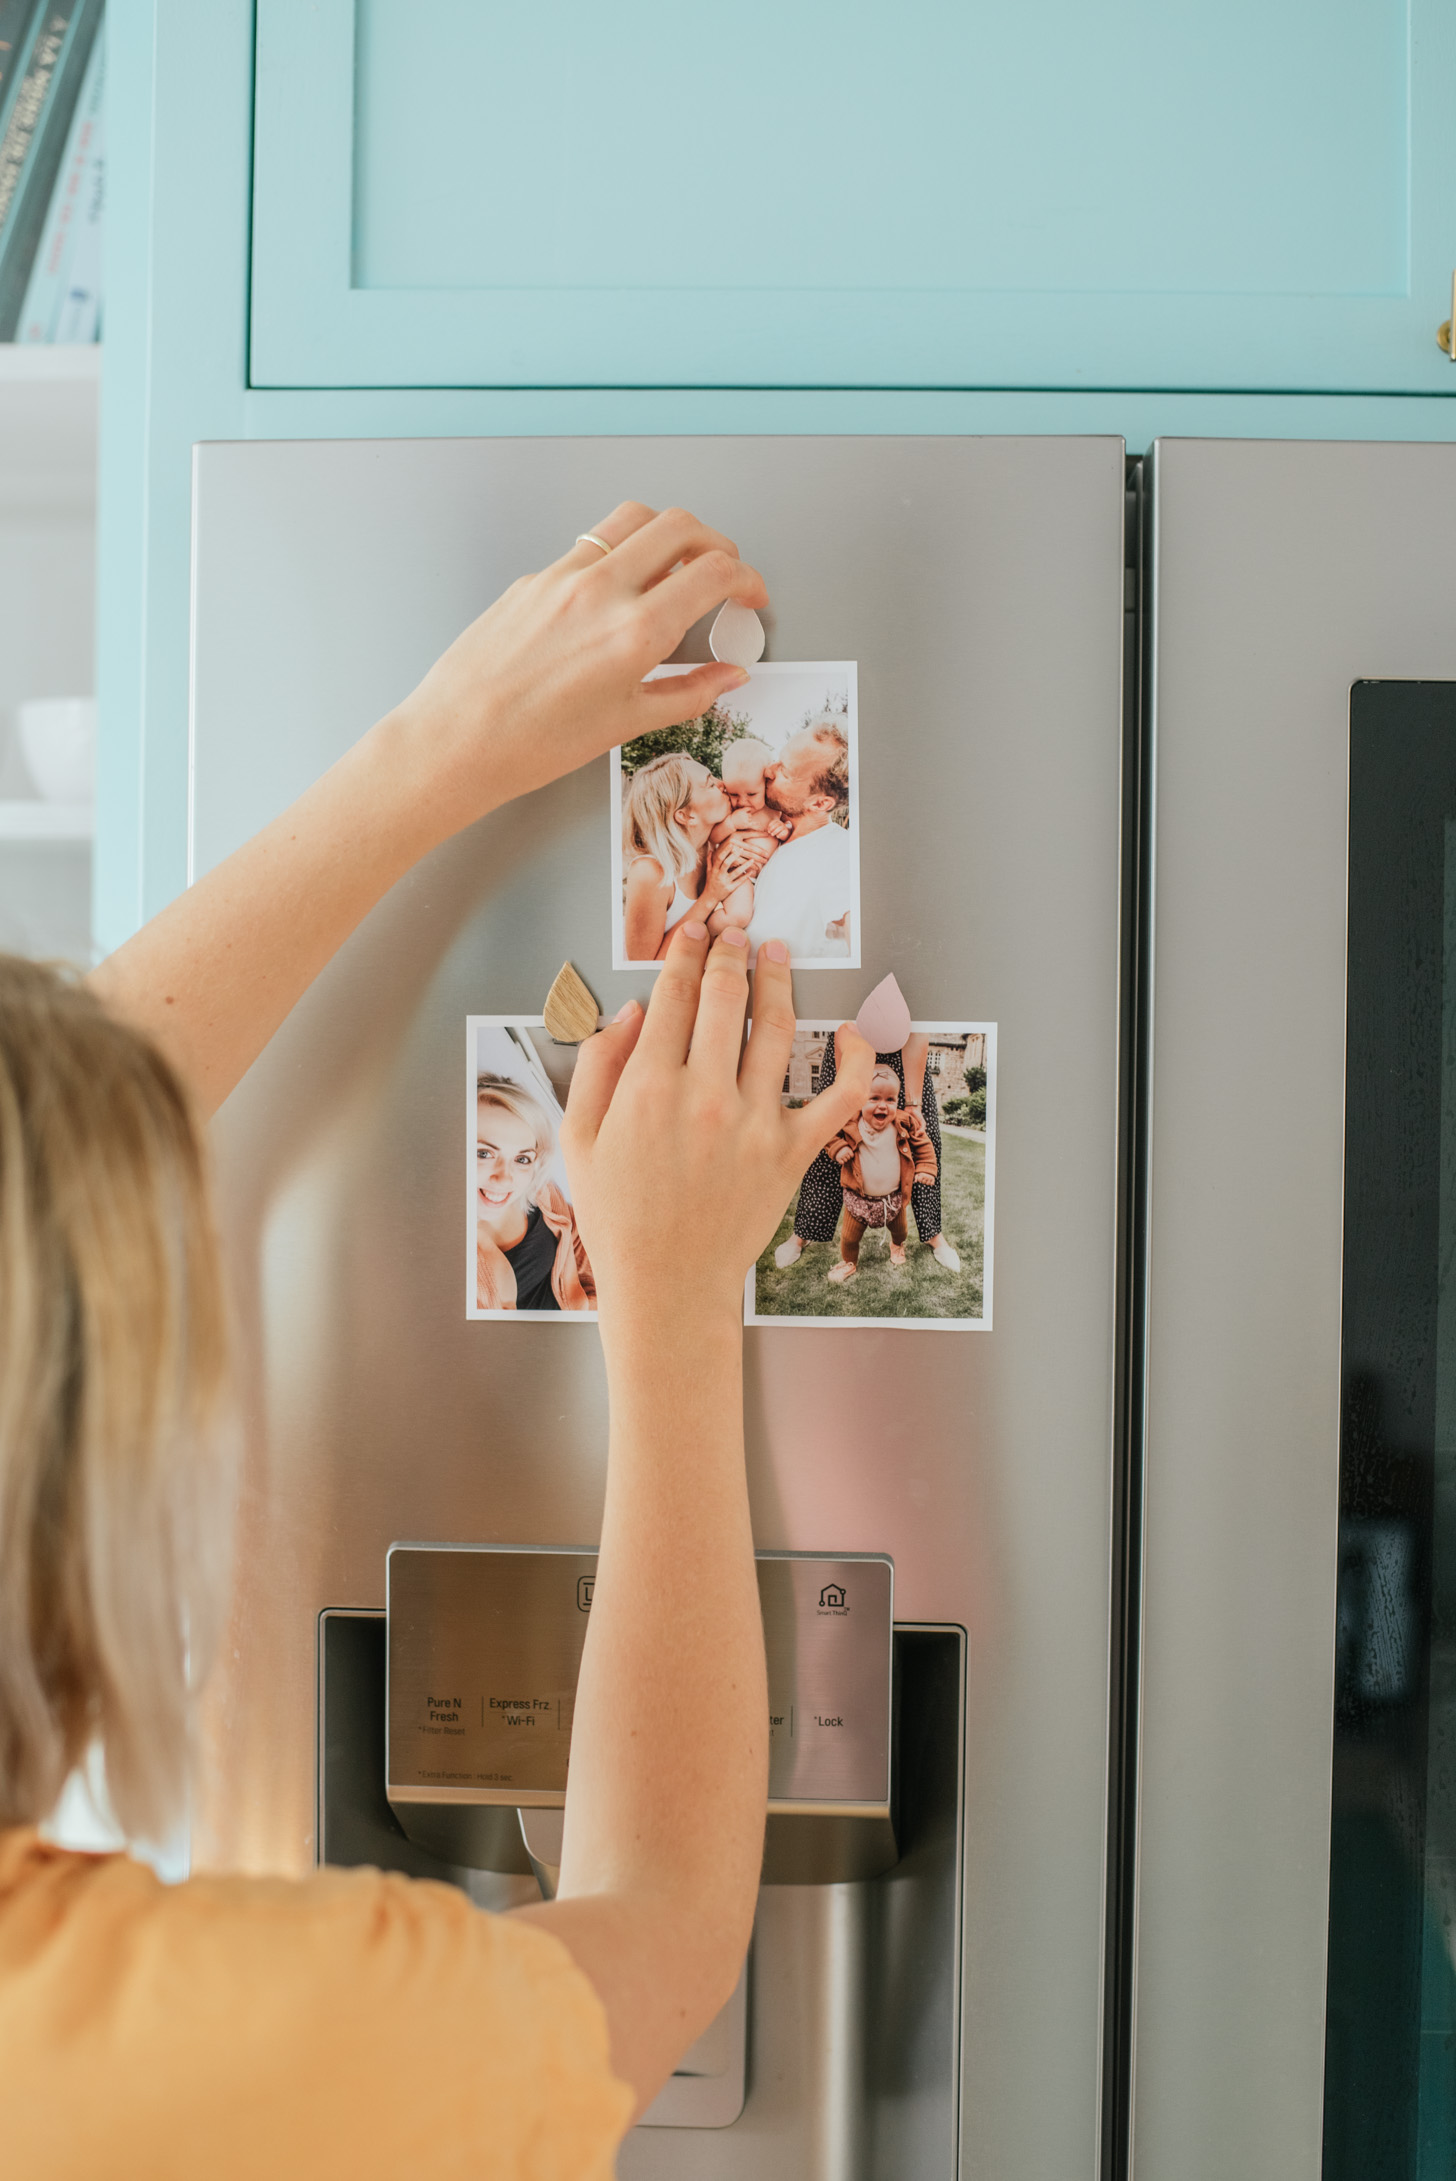 Hedendaags DIY koelkast magneten | A Cup of Life GW-39